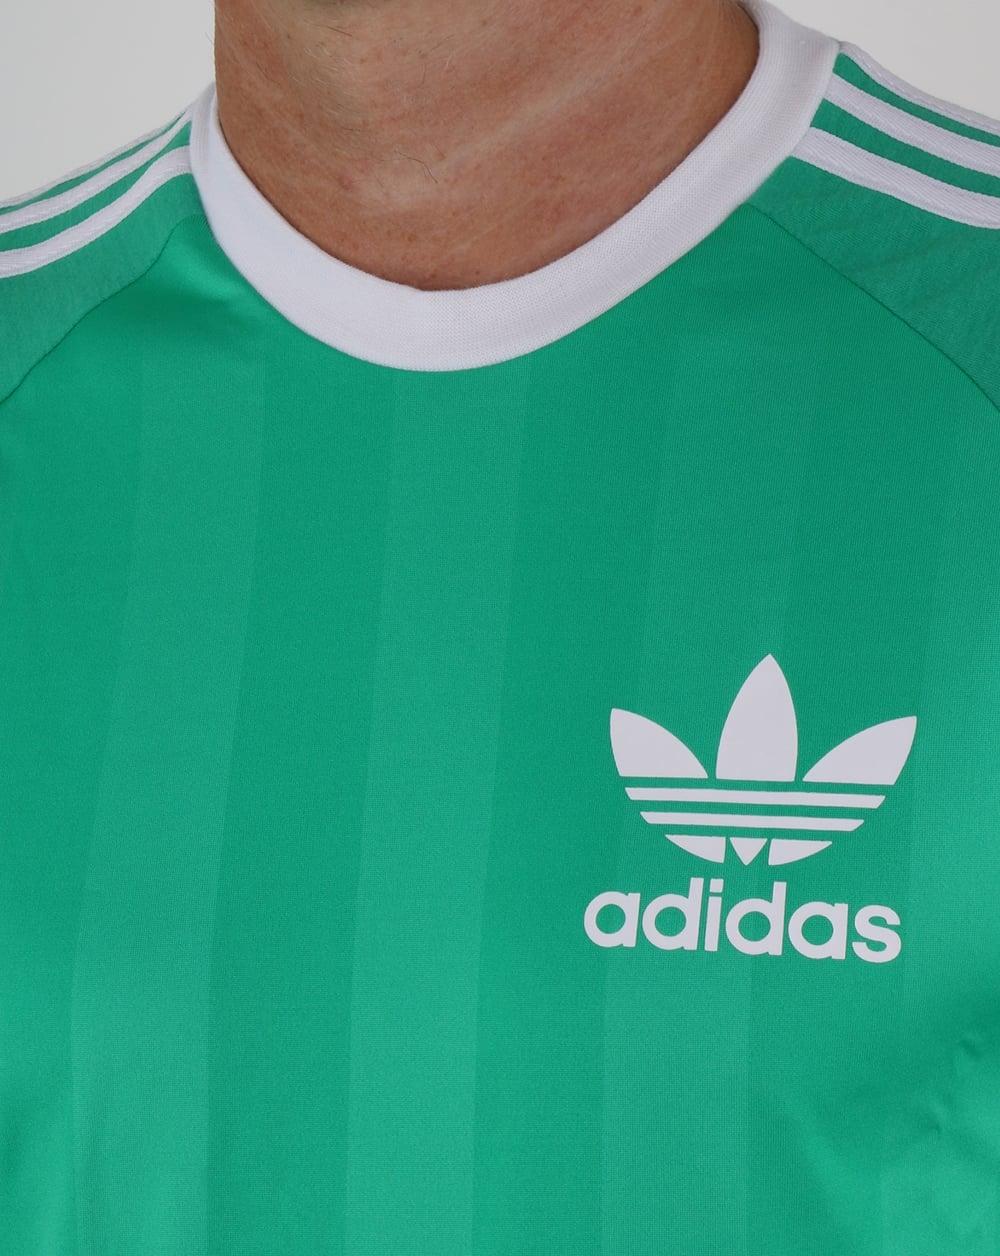 b4f04d51dd27 Adidas Originals Old Skool 3 Stripes T Shirt Vivid Green